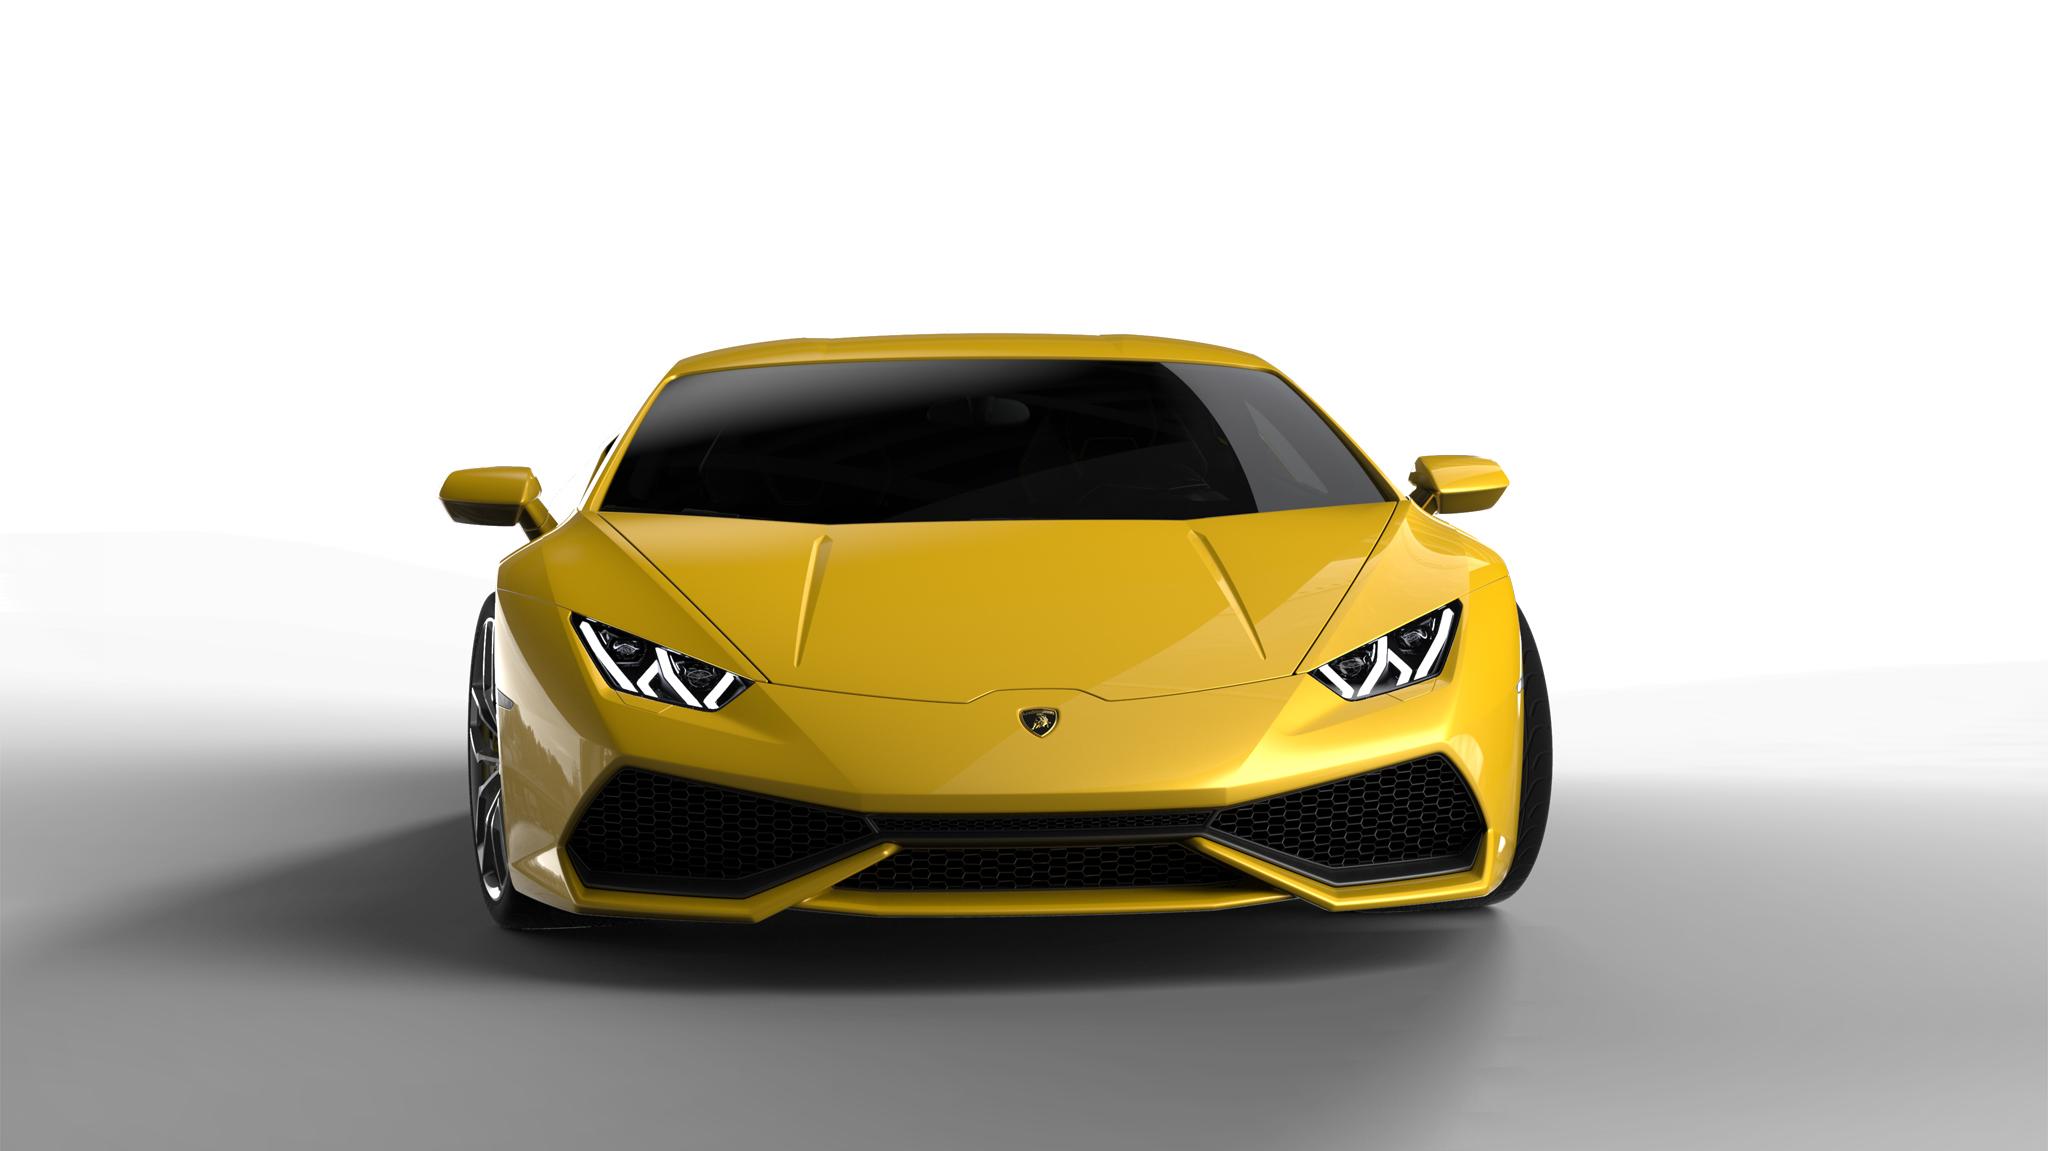 لامبورجيني هوراكان 2014 , اسعار ومعلومات Lamborghini Huracan2014